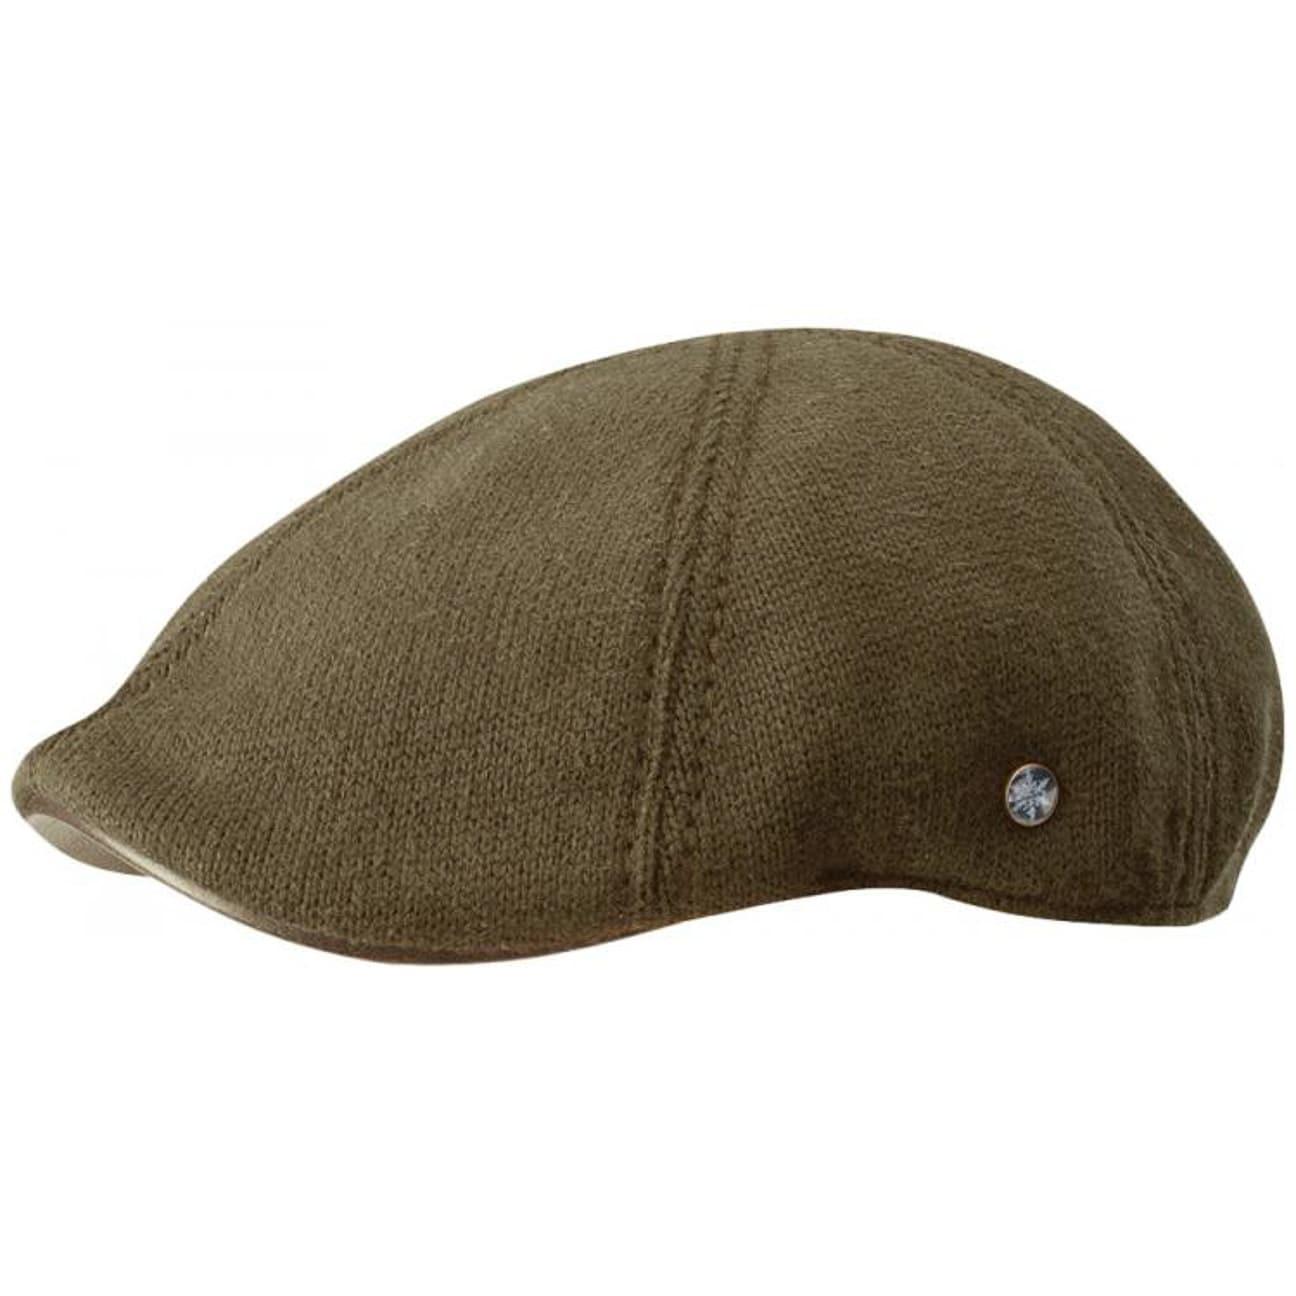 Flat hat Ivy Men/´s with Peak Stetson Muskegon Gatsby Cap Men Lining Autumn-Winter